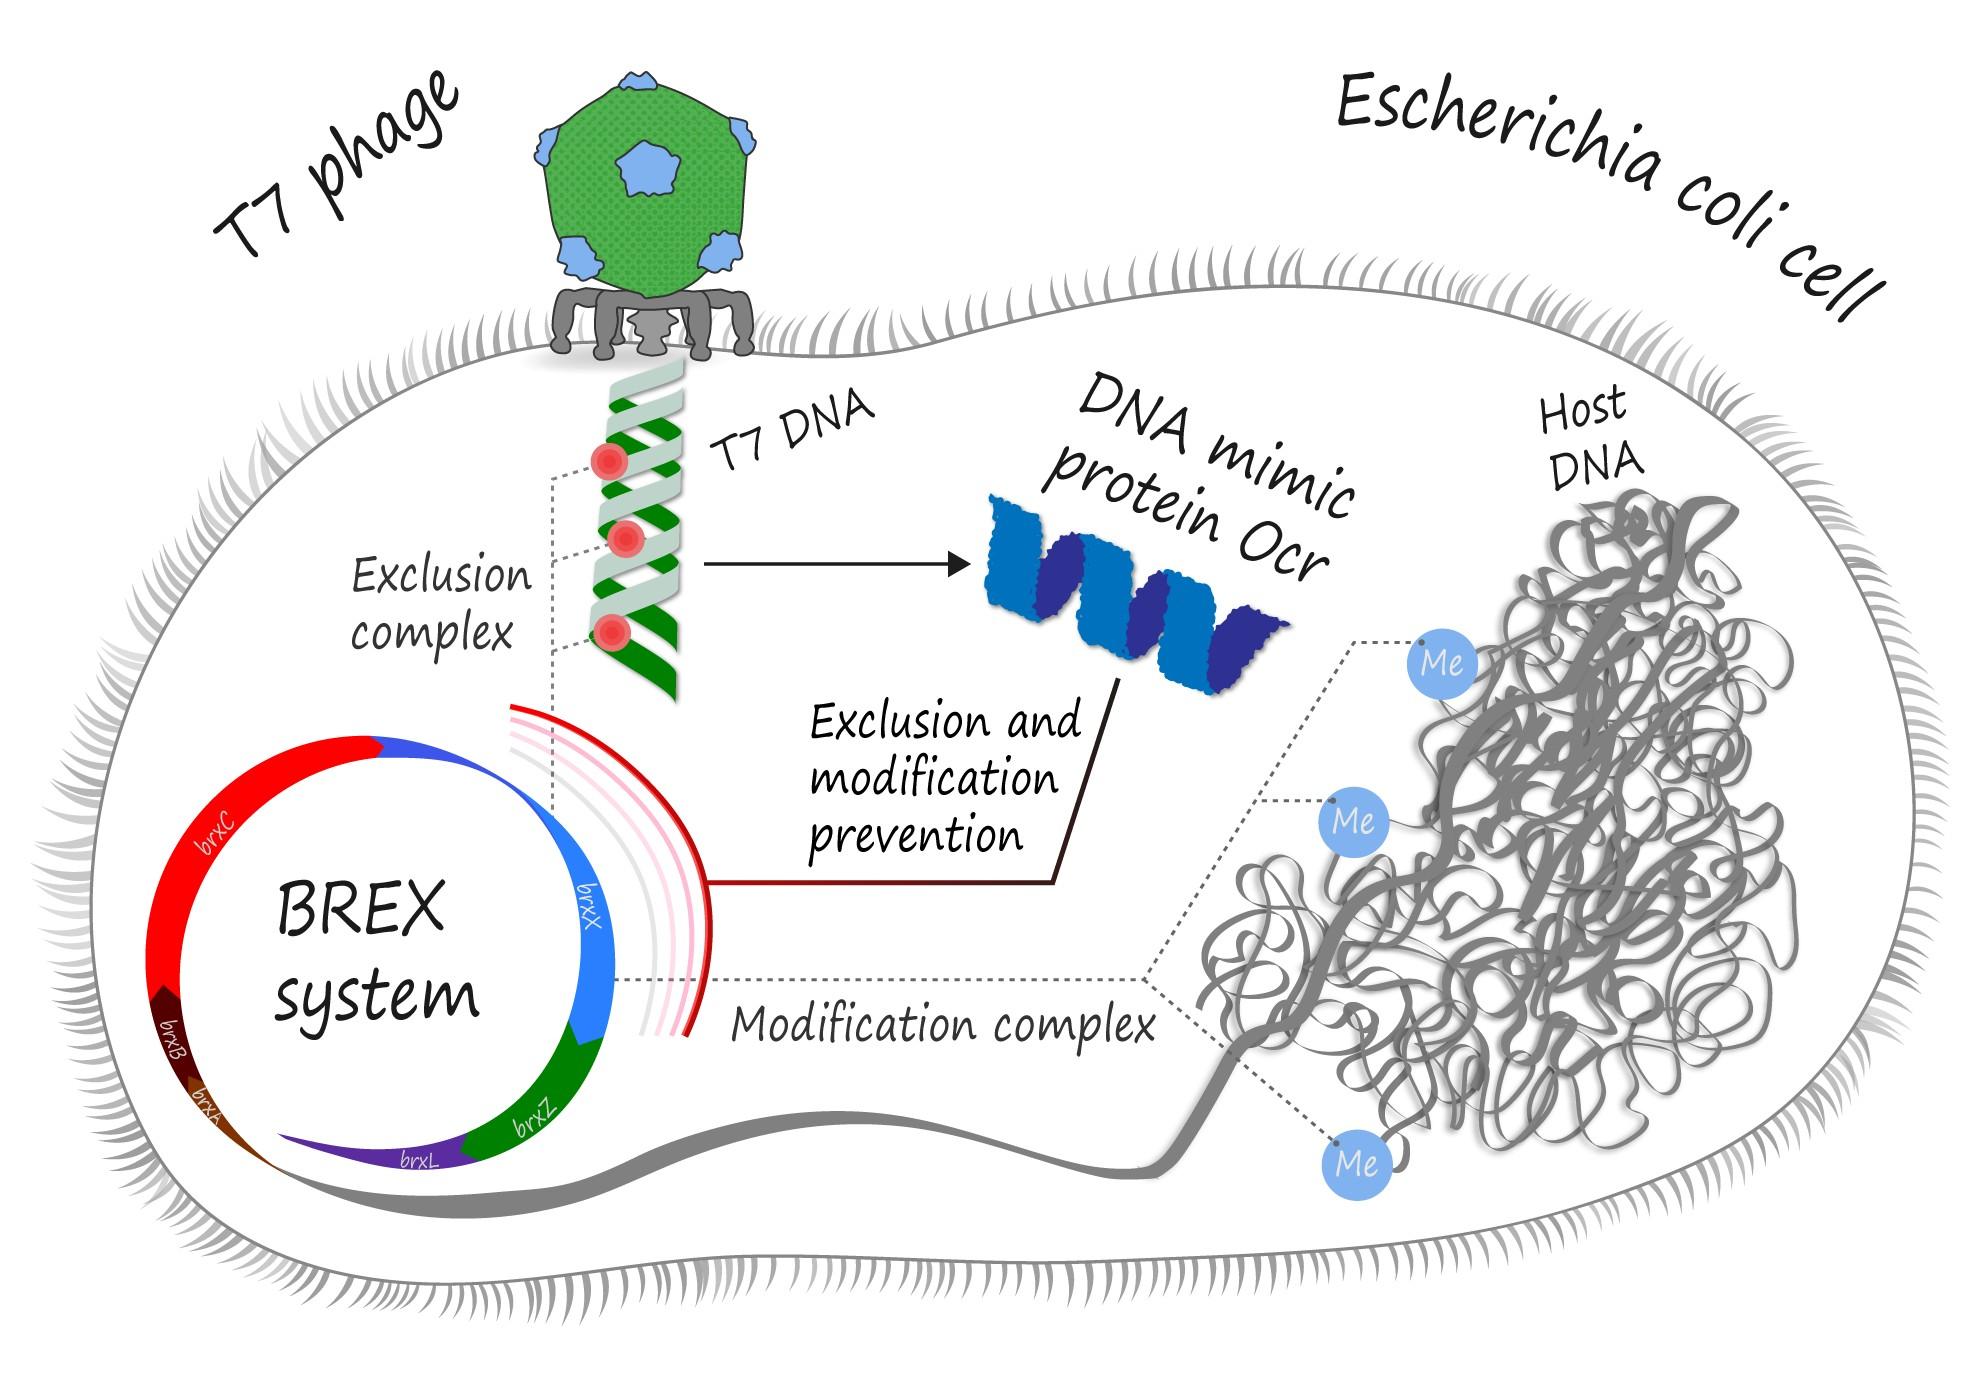 ocr-protein-vs-brex-system-4